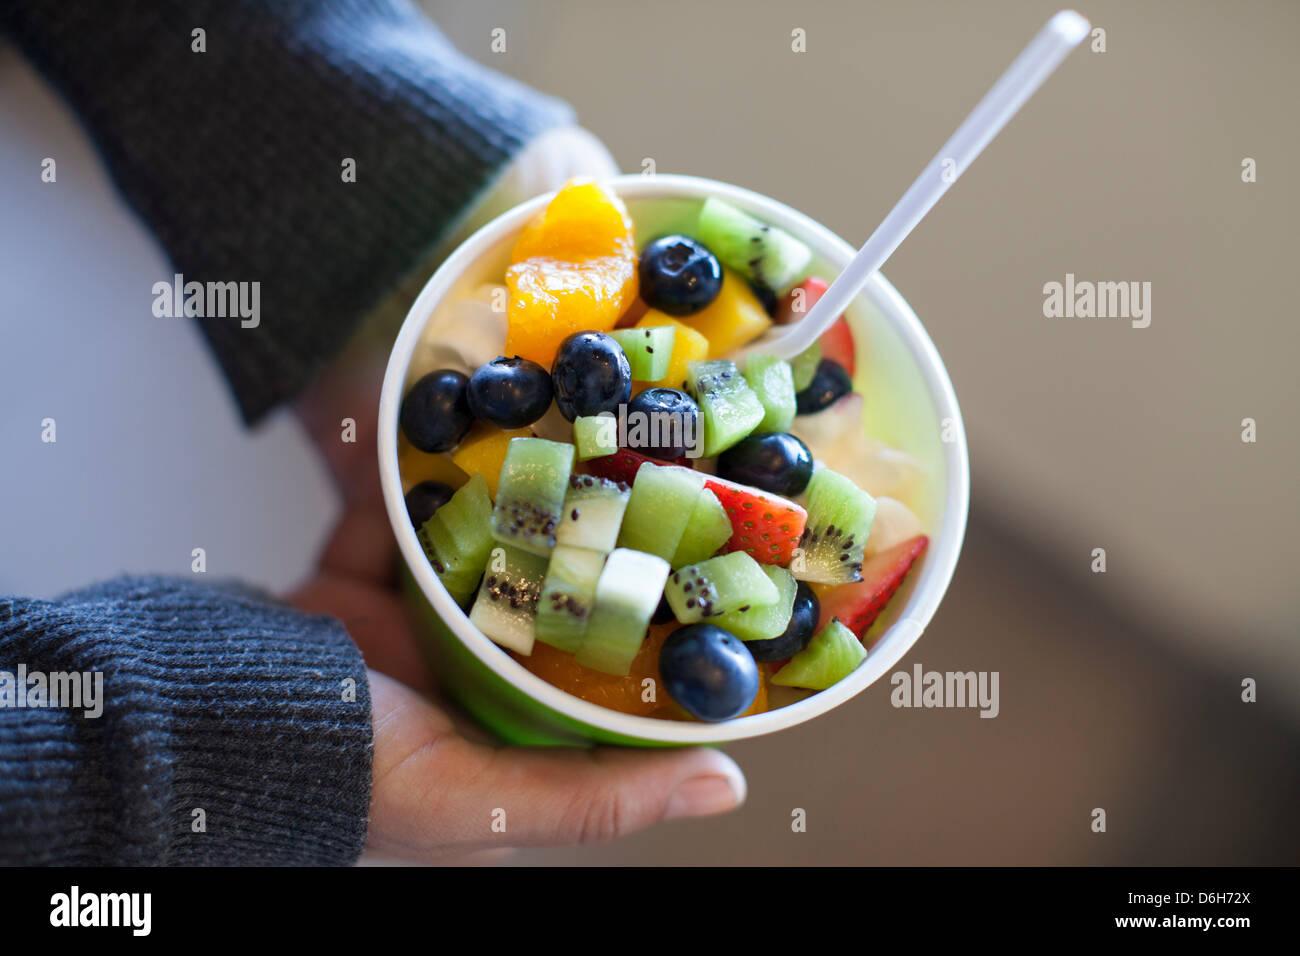 Nahaufnahme von gefrorenen Joghurt Stockbild